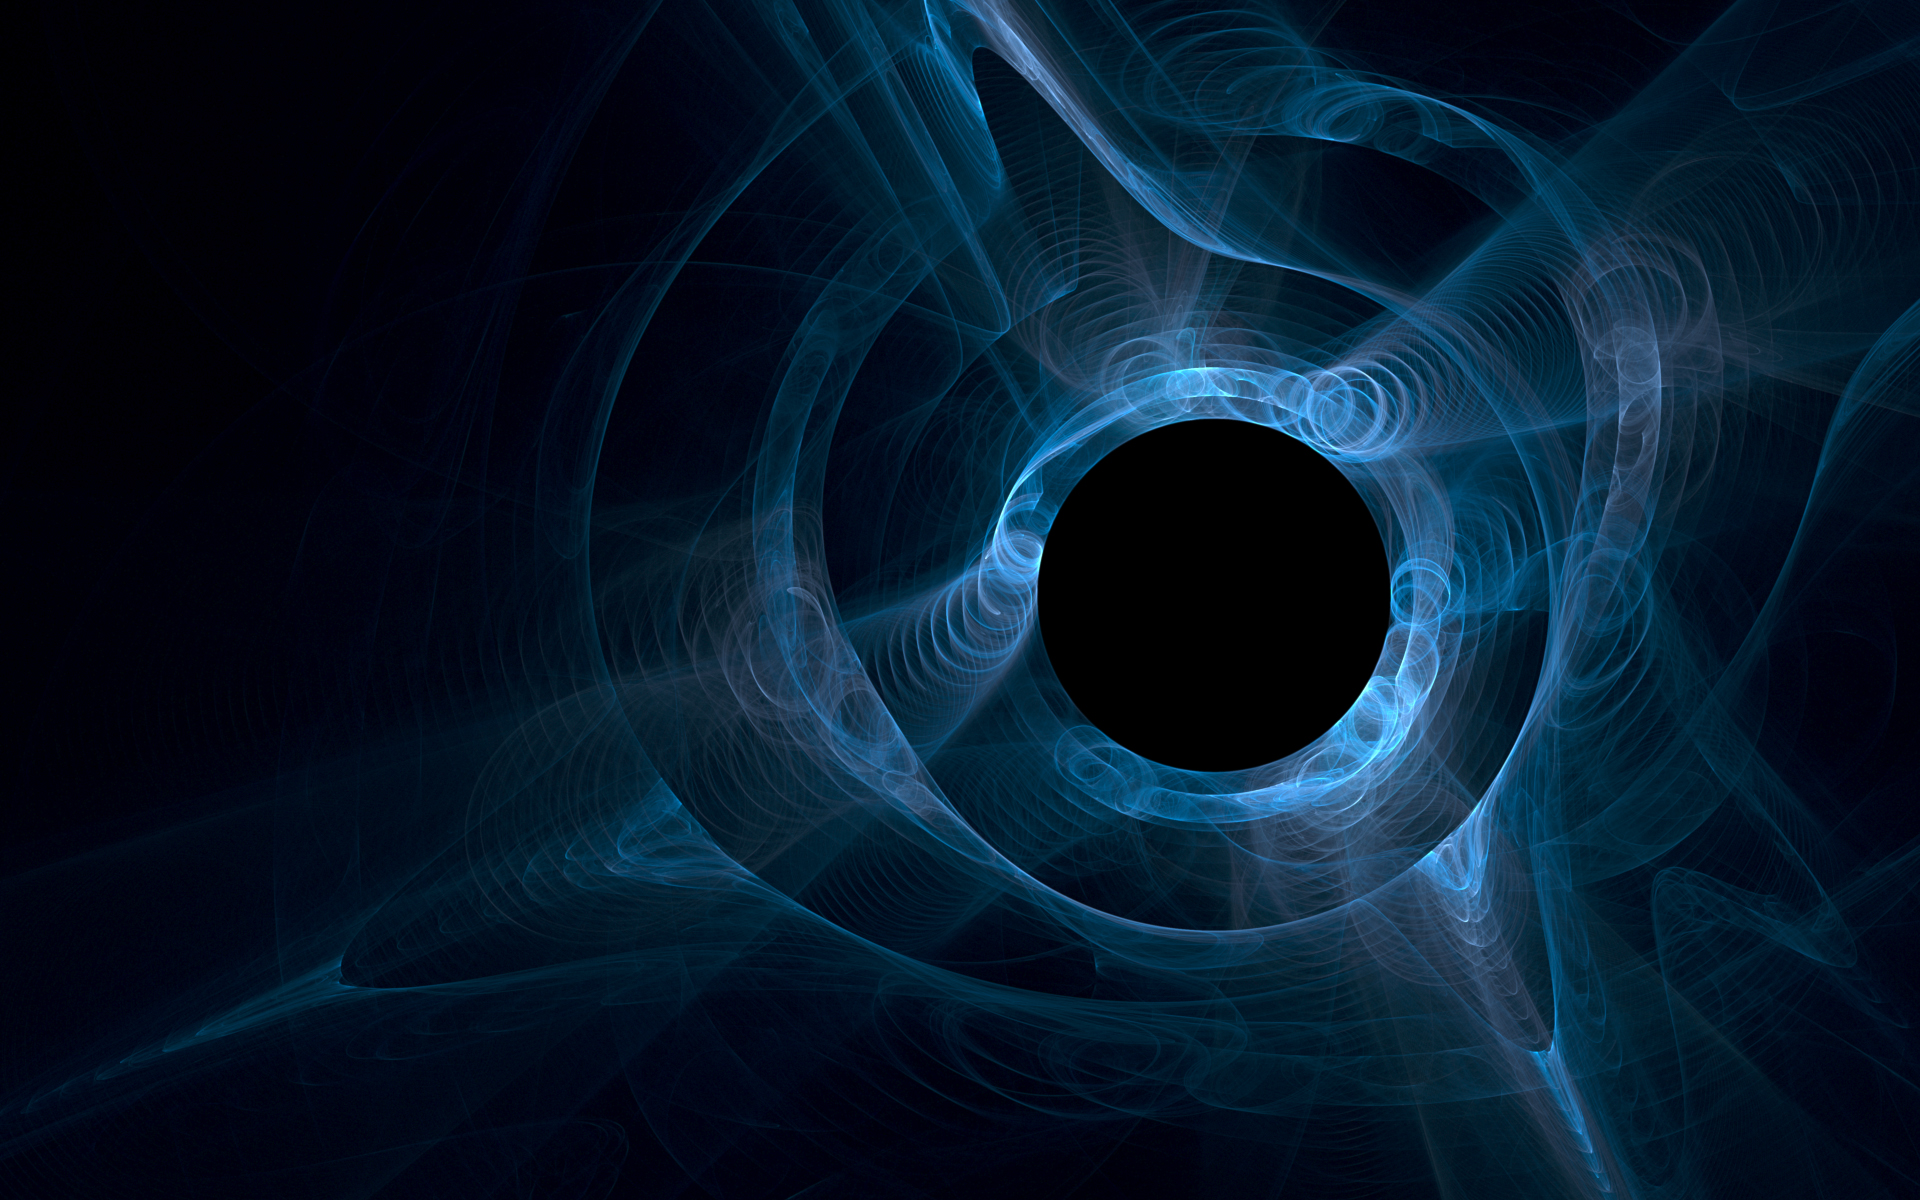 [44+] Black Hole Wallpaper Moving on WallpaperSafari